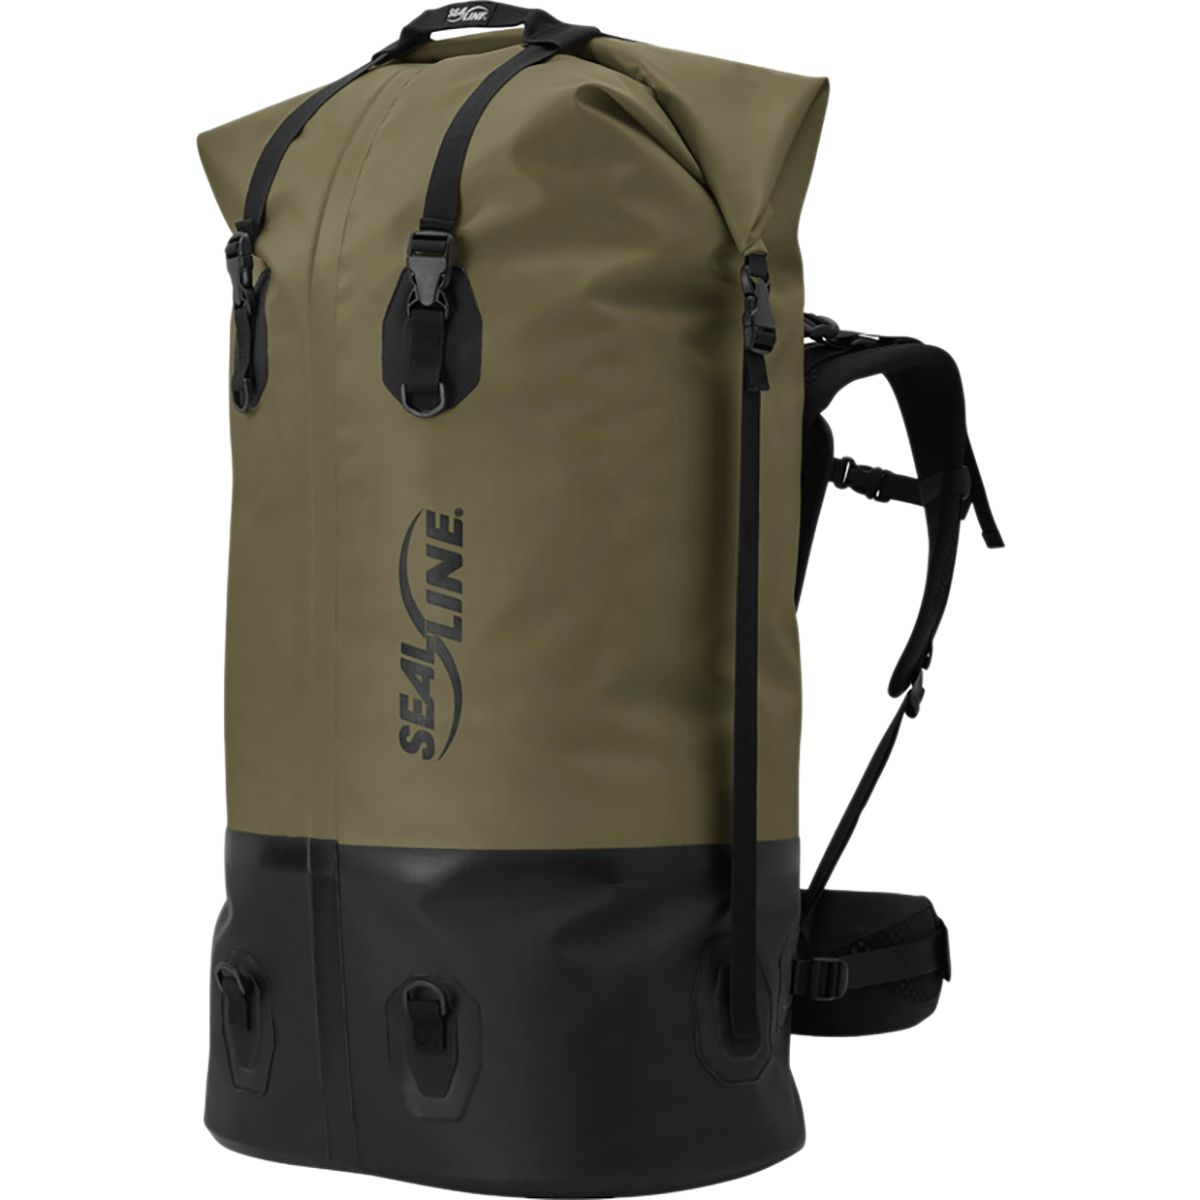 SealLine Pro Dry Pack